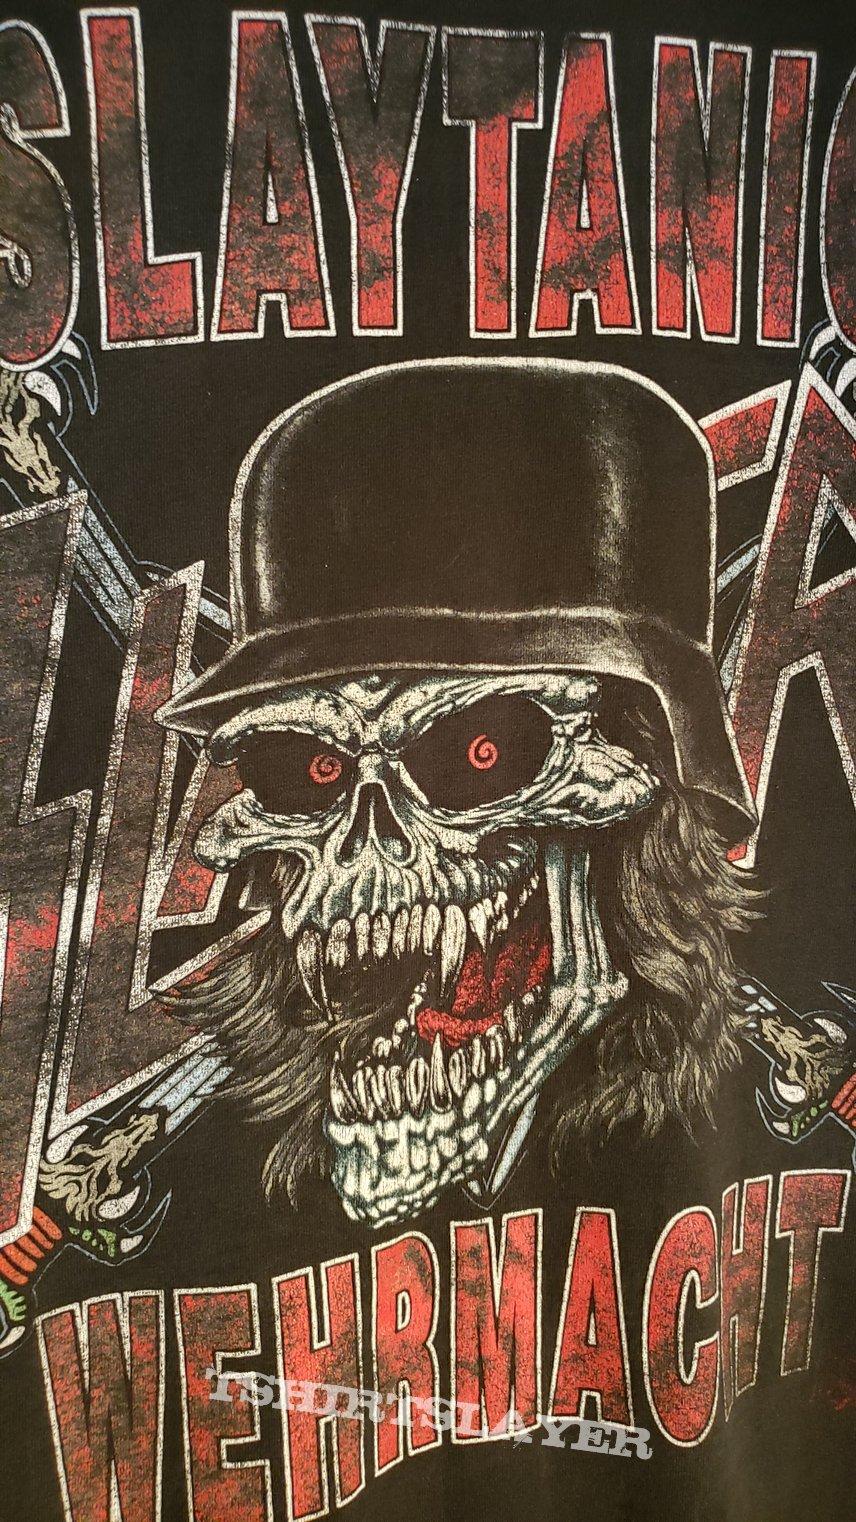 Slayer - World Sacrifice 1989 Canadian Version